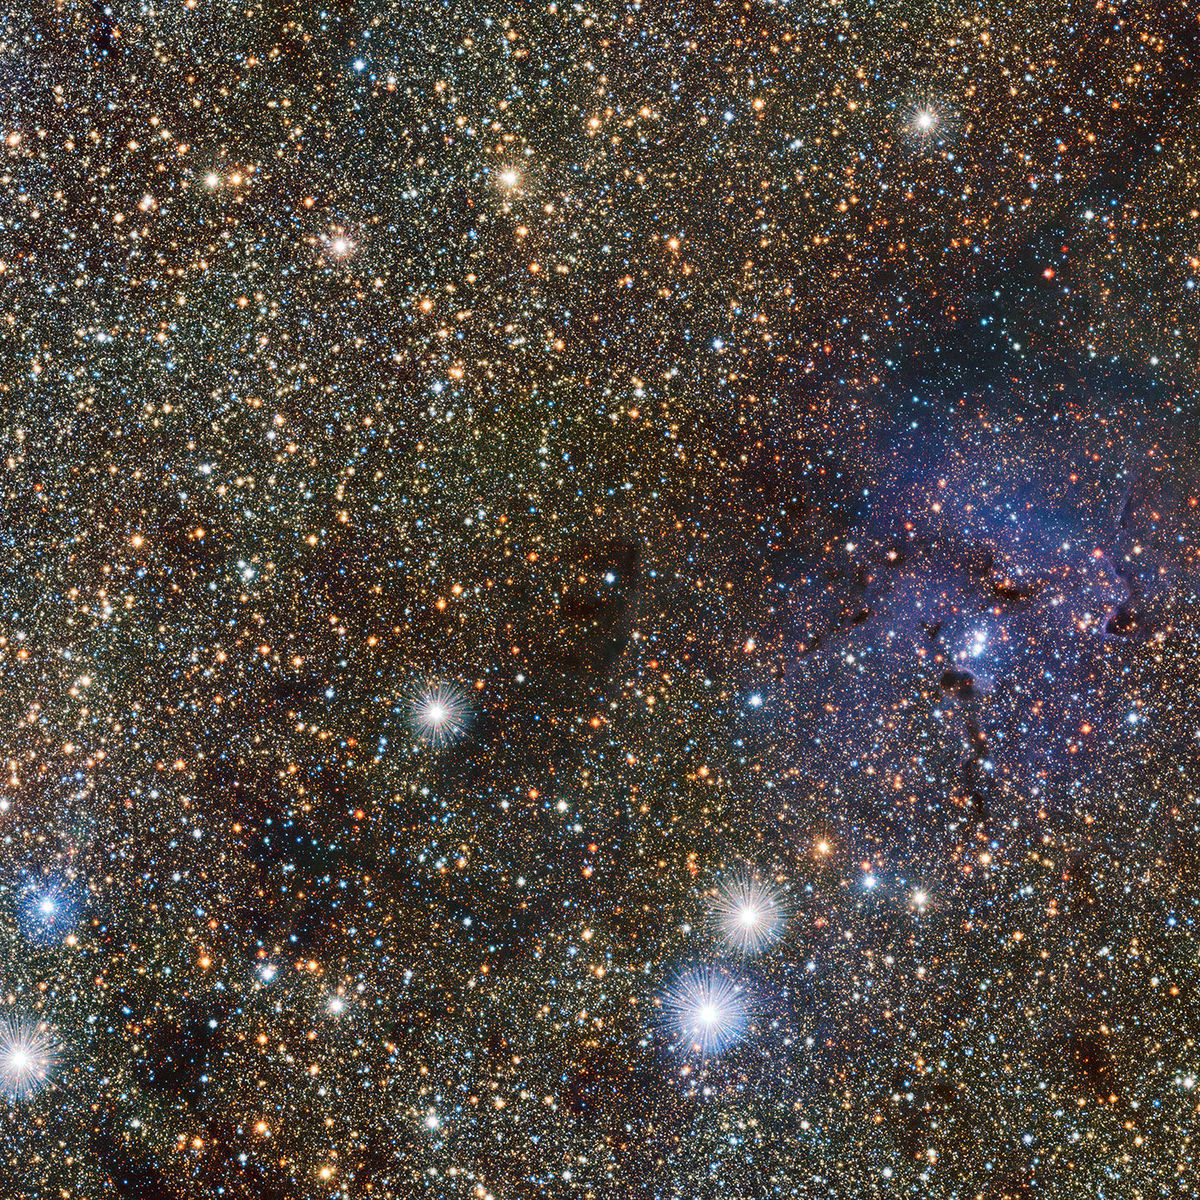 The Trifid Nebula in infrared light. Credit: ESO/VVV consortium/D. Minniti/Gábor Tóth